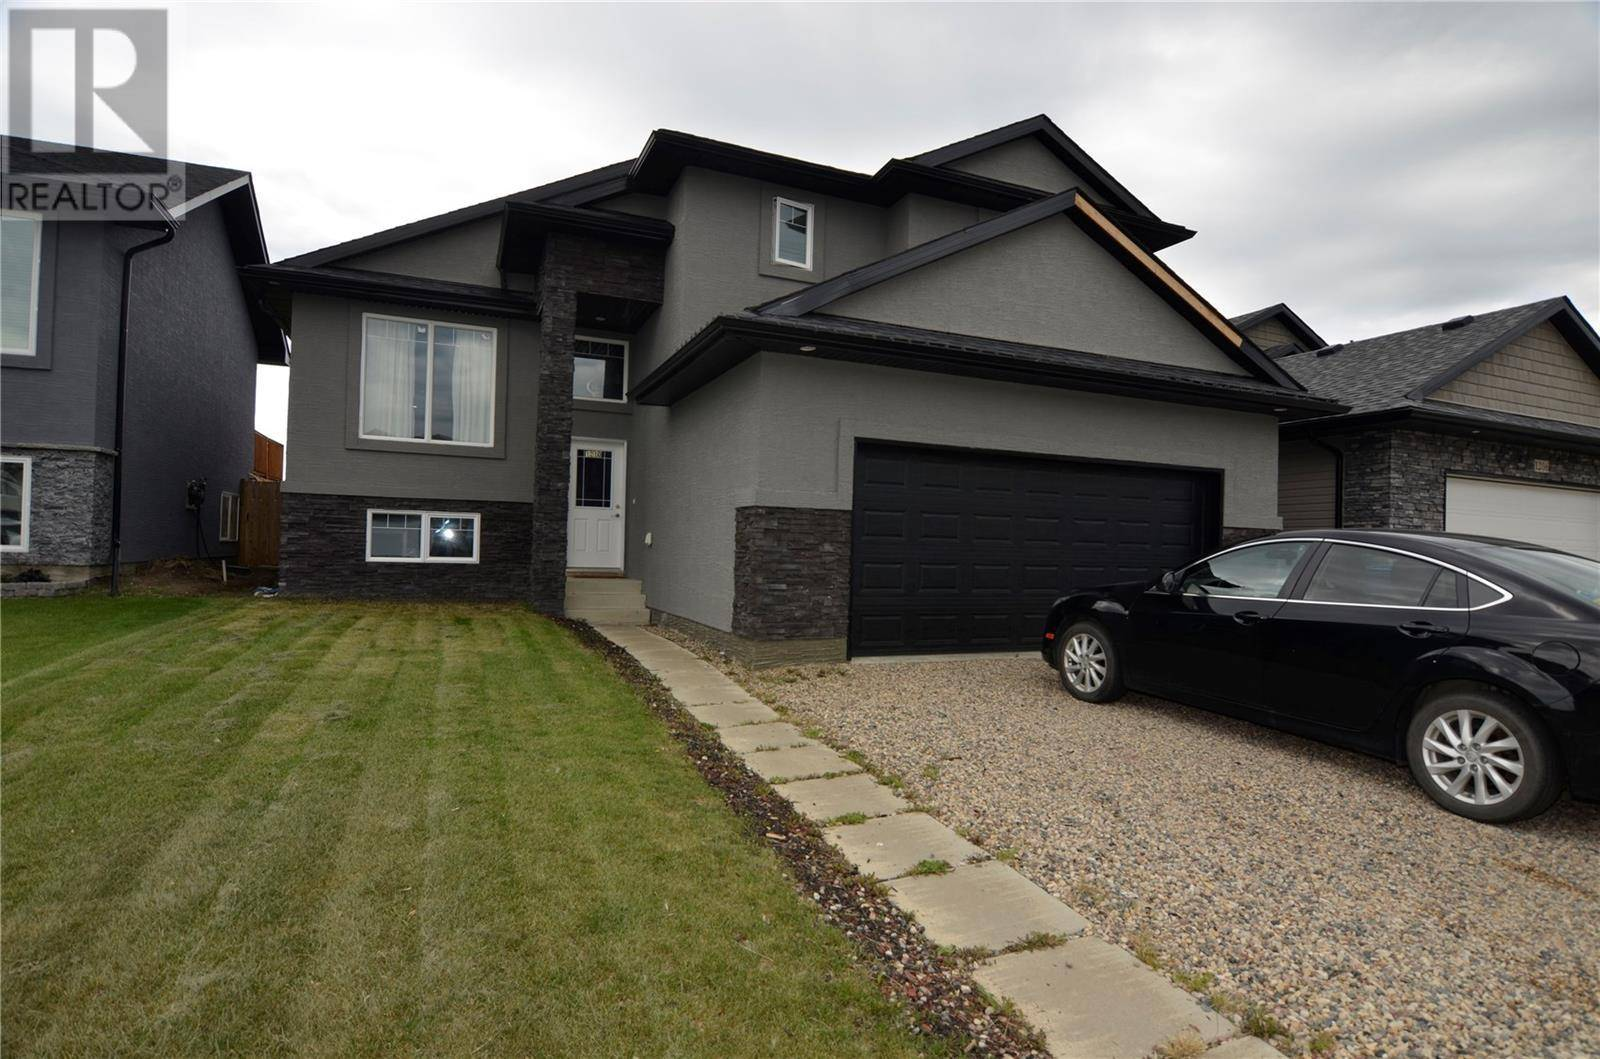 House for sale at 1210 Hargreaves Wy Saskatoon Saskatchewan - MLS: SK783251